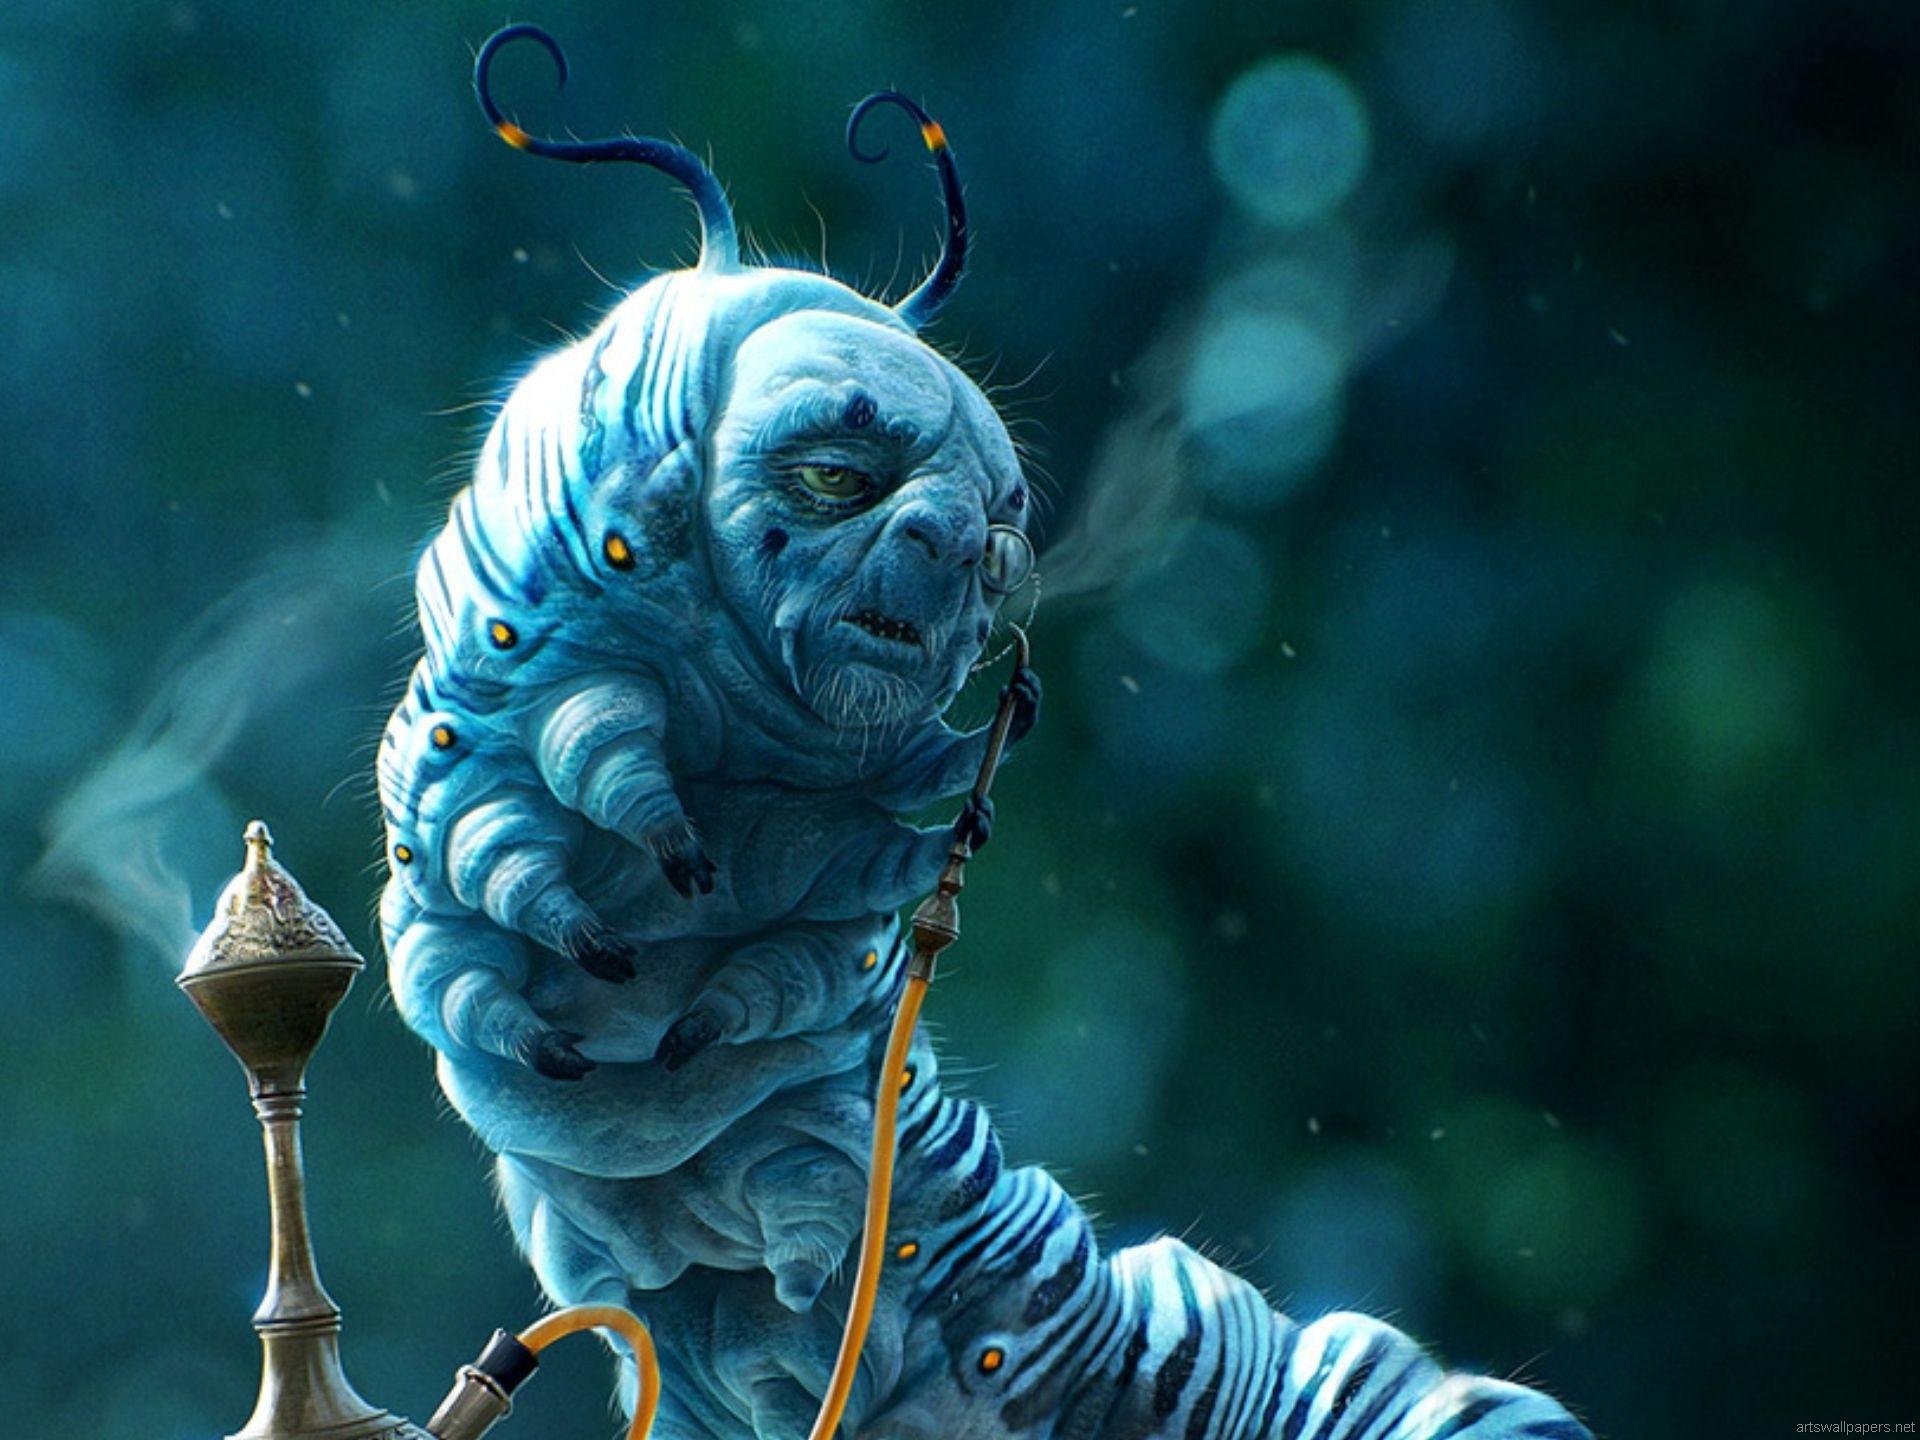 Alice In Wonderland Wallpaper Art posted by John Peltier